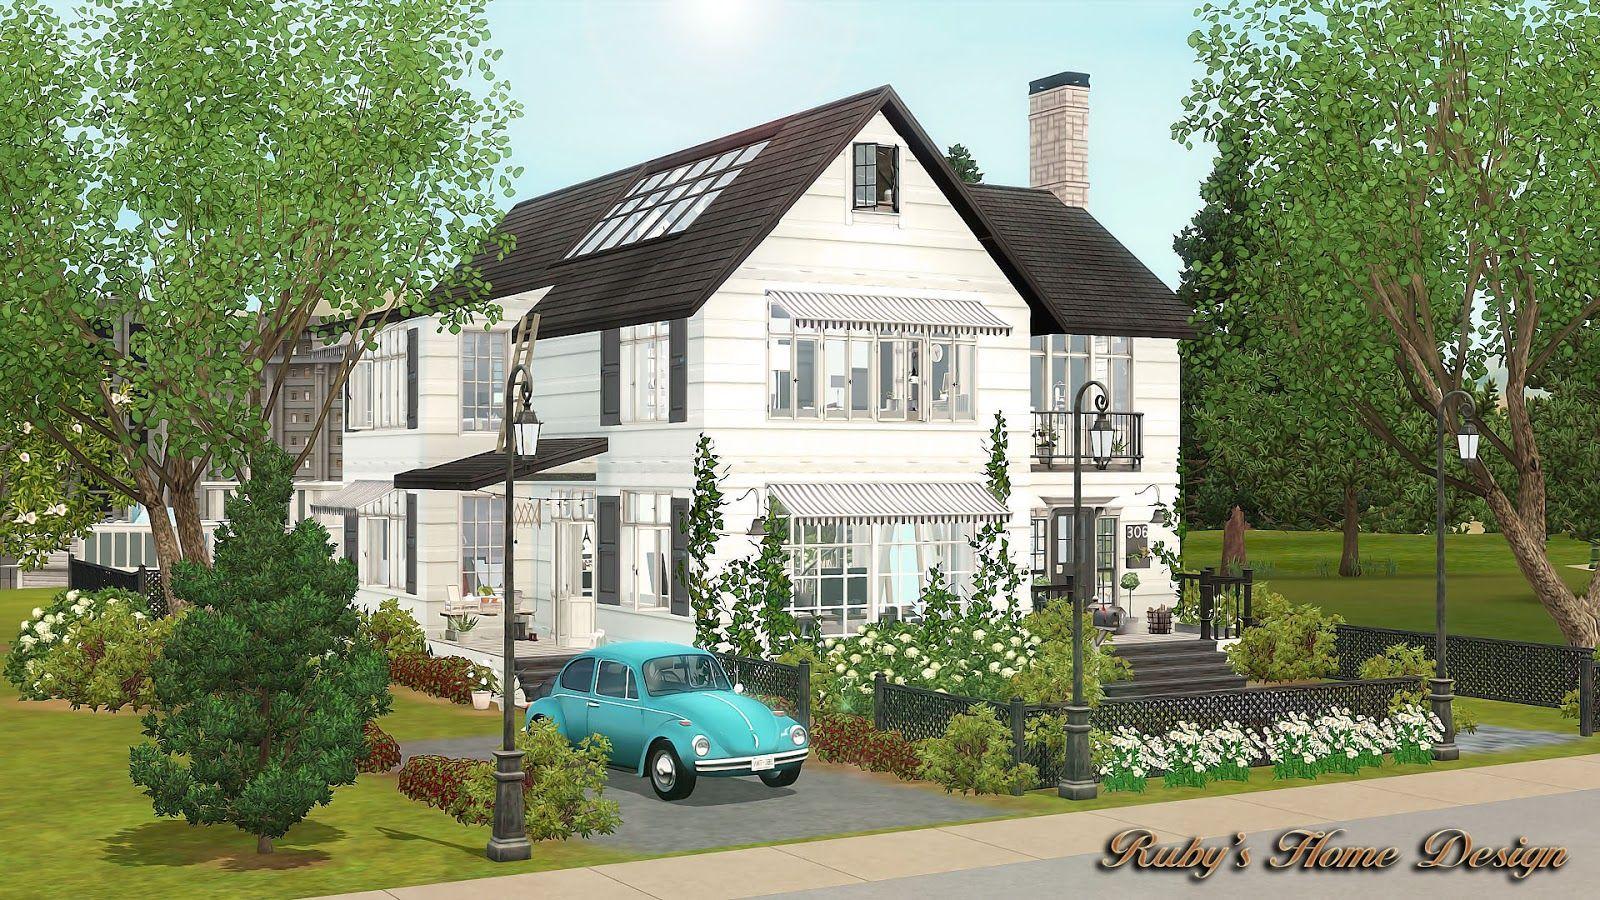 Emejing Sims 3 Home Design Ideas - Amazing Design Ideas - luxsee.us